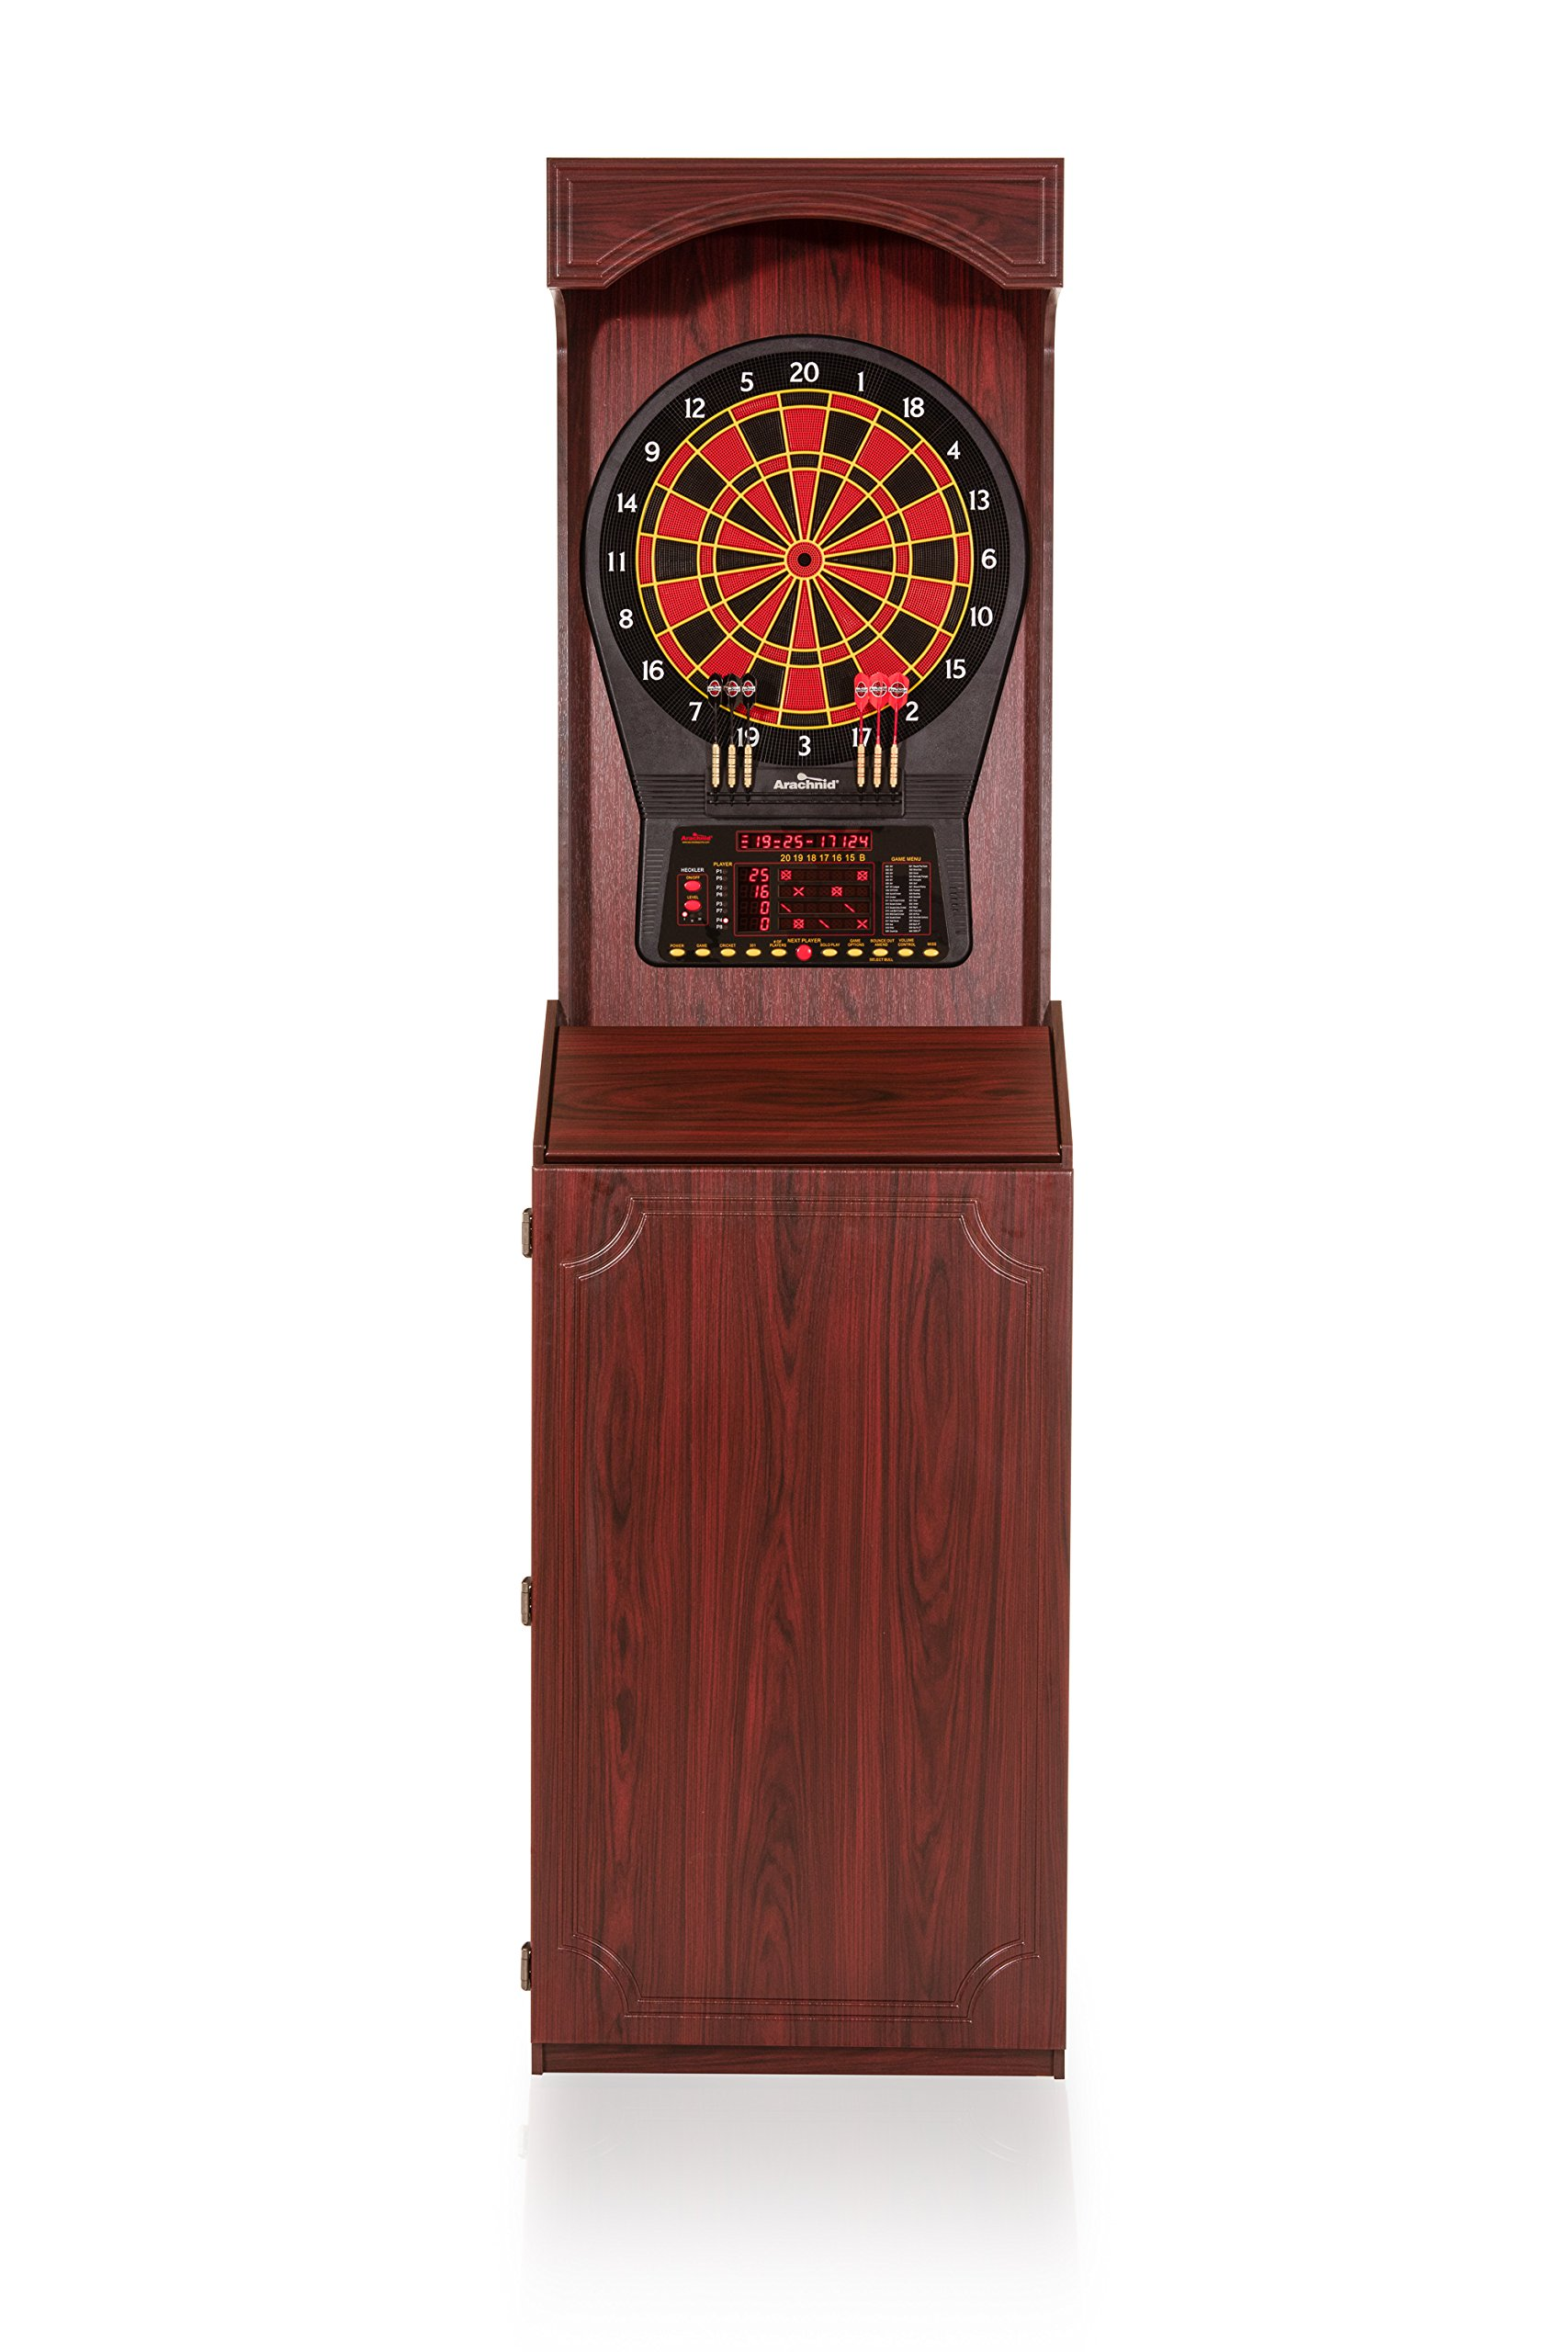 Arachnid Cricket Pro 800 Standing Electronic Dartboard